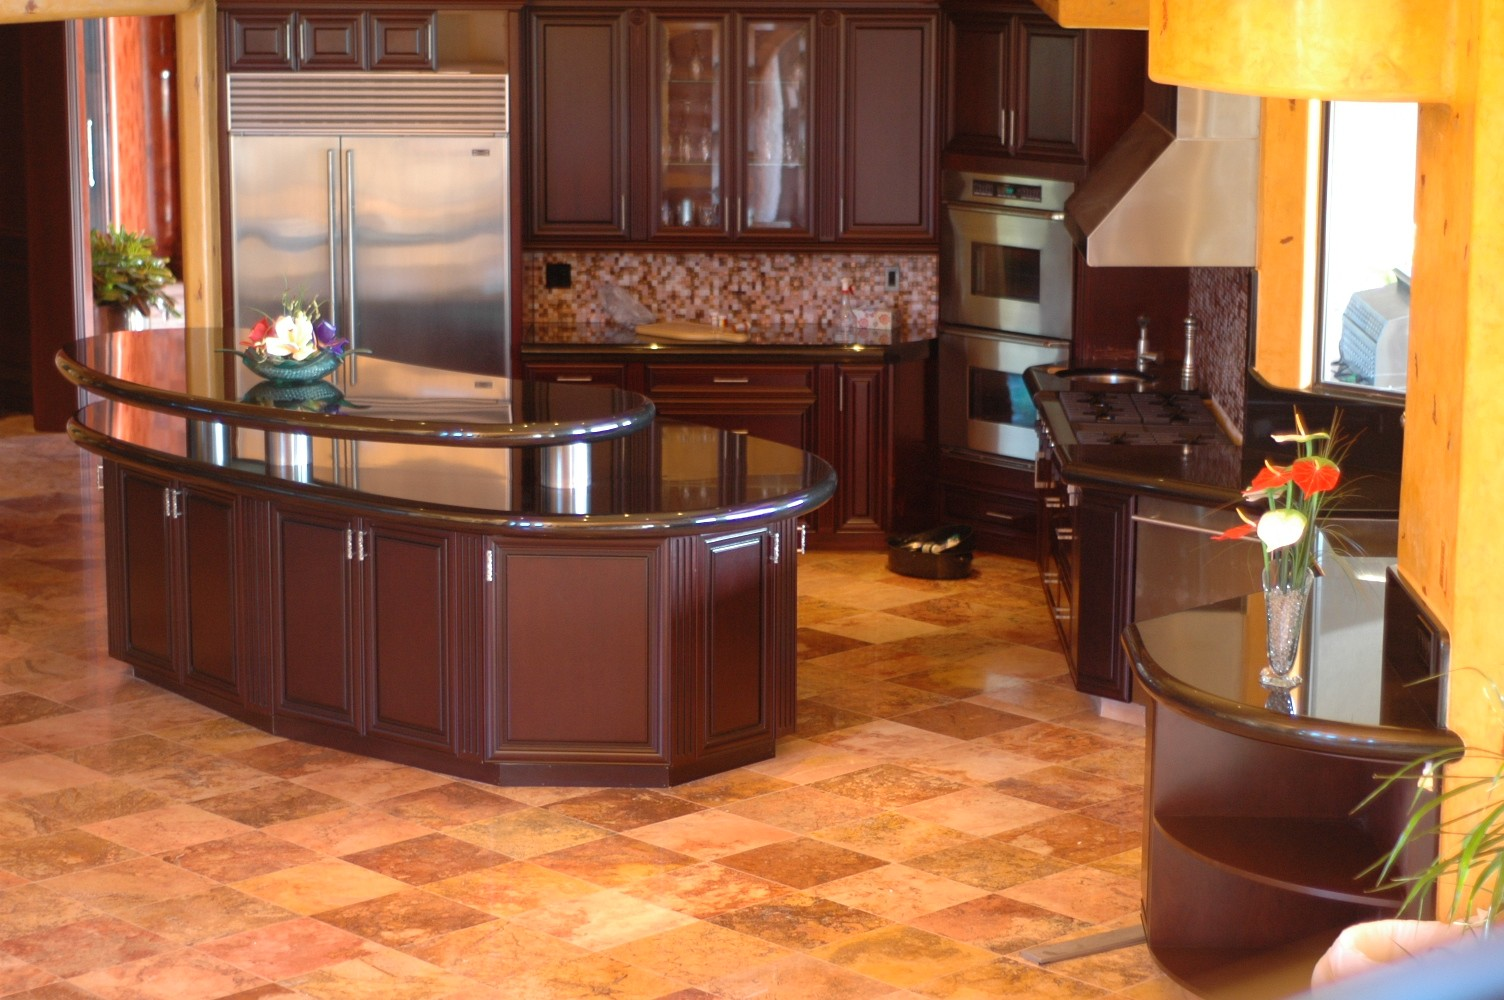 granite kitchen design ideas photo - 8